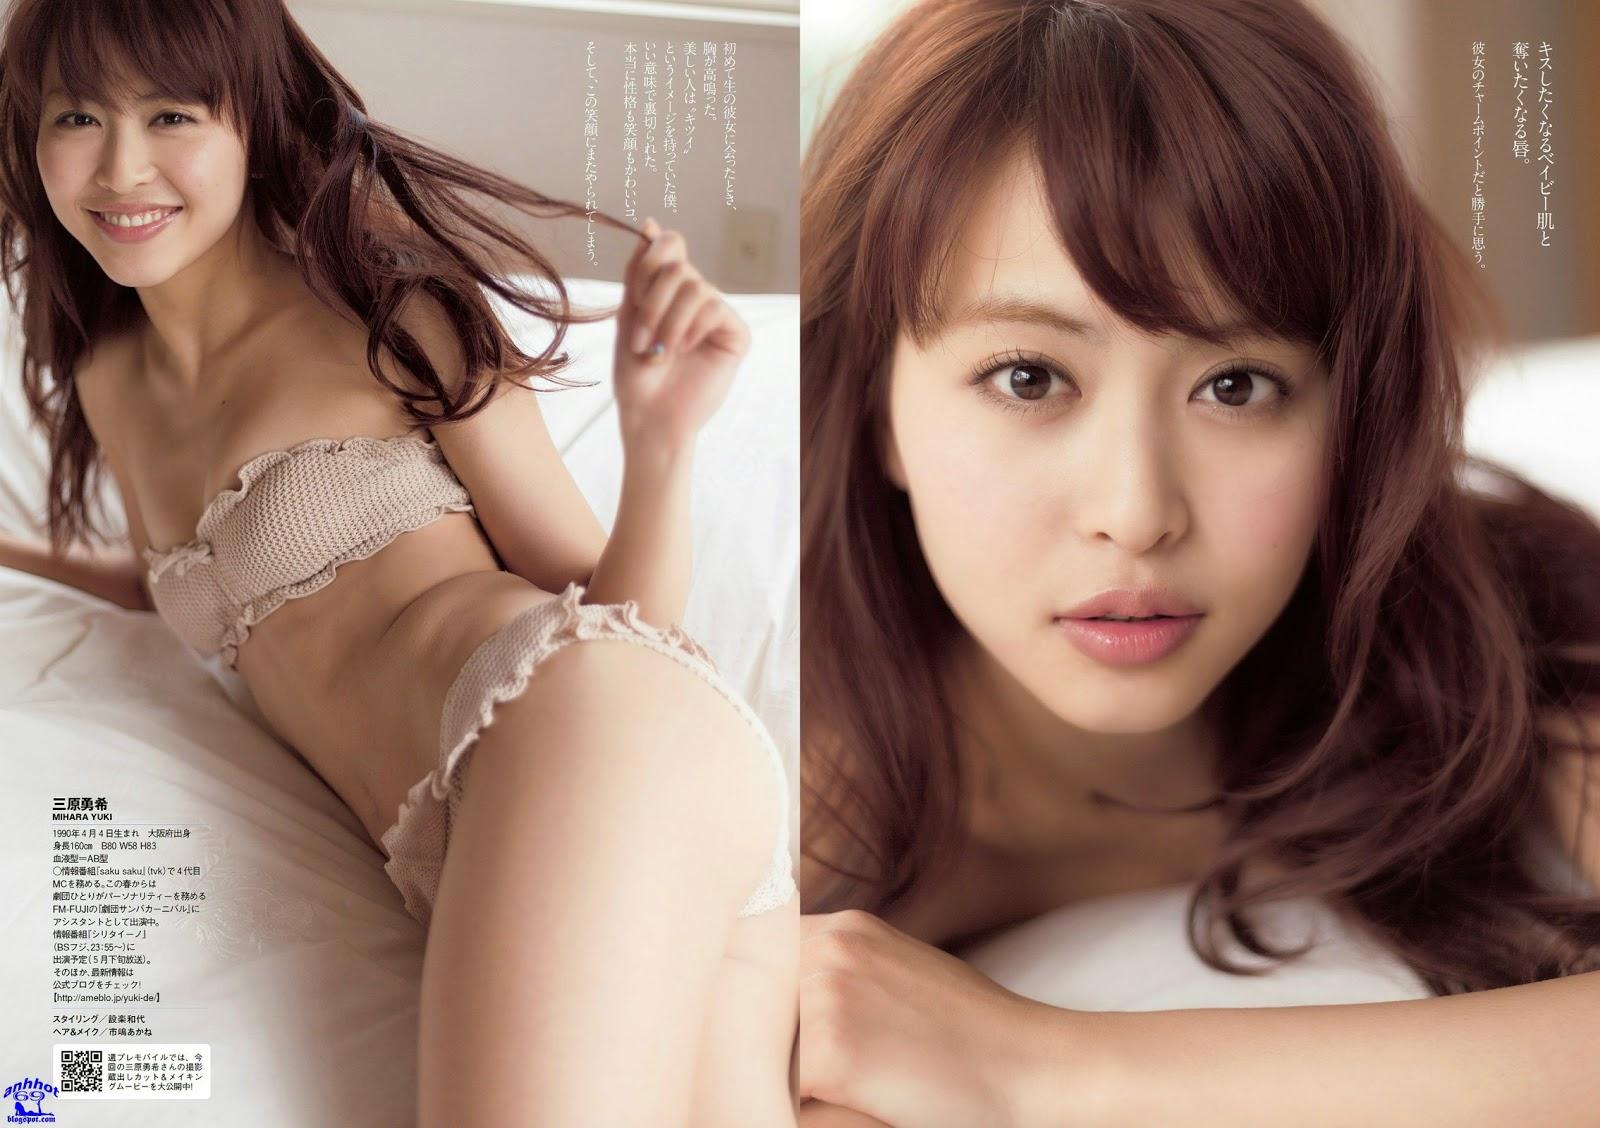 yuuki-mihara-02699850